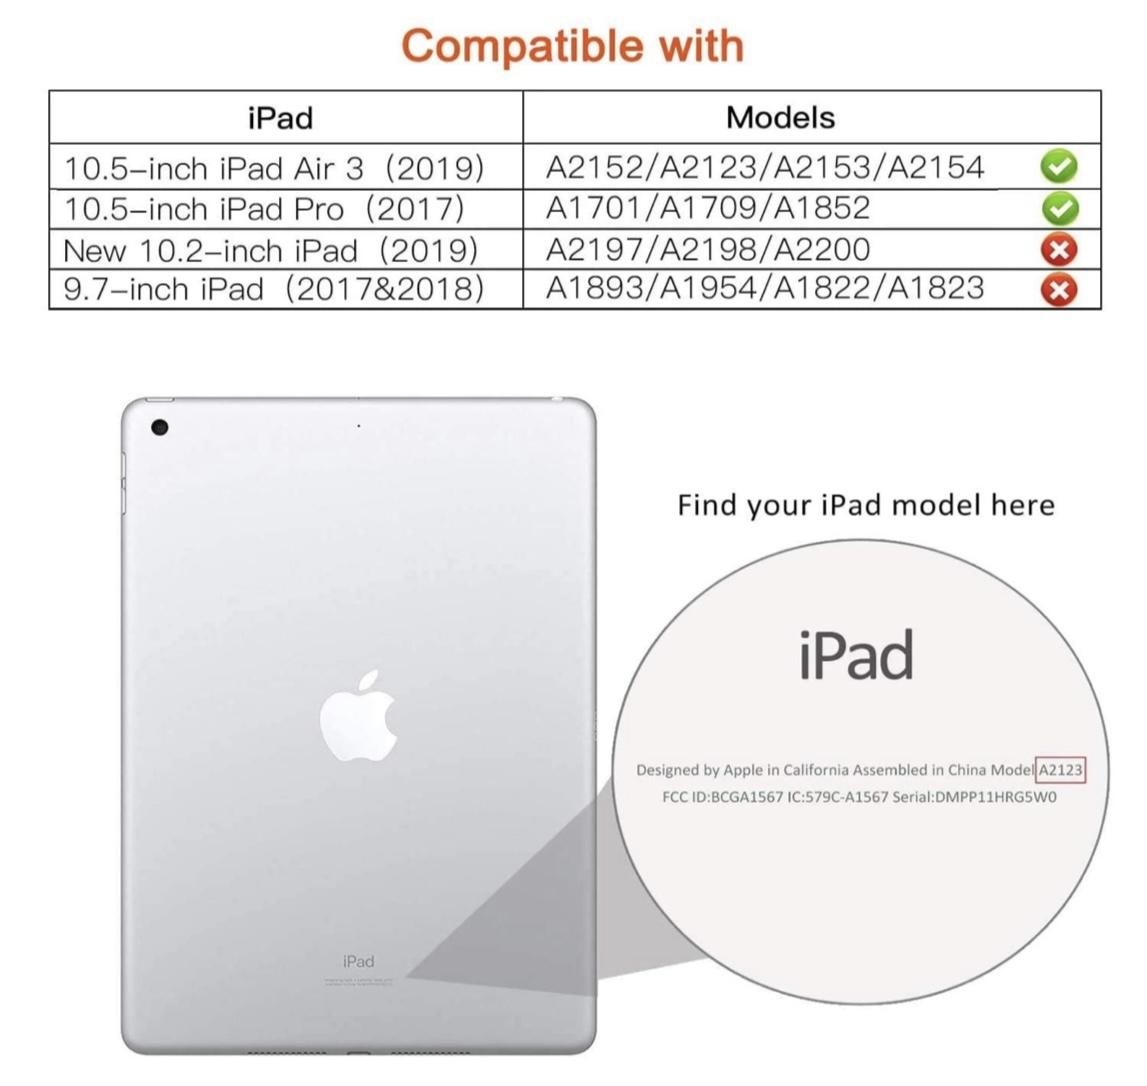 iPad Air 2019年型 10.5インチ ケース (黒) iPad Pro 2017年型 合革レザー 360回転 スタンドケース 耐衝撃 多角度 アイパッド保護カバー_画像9